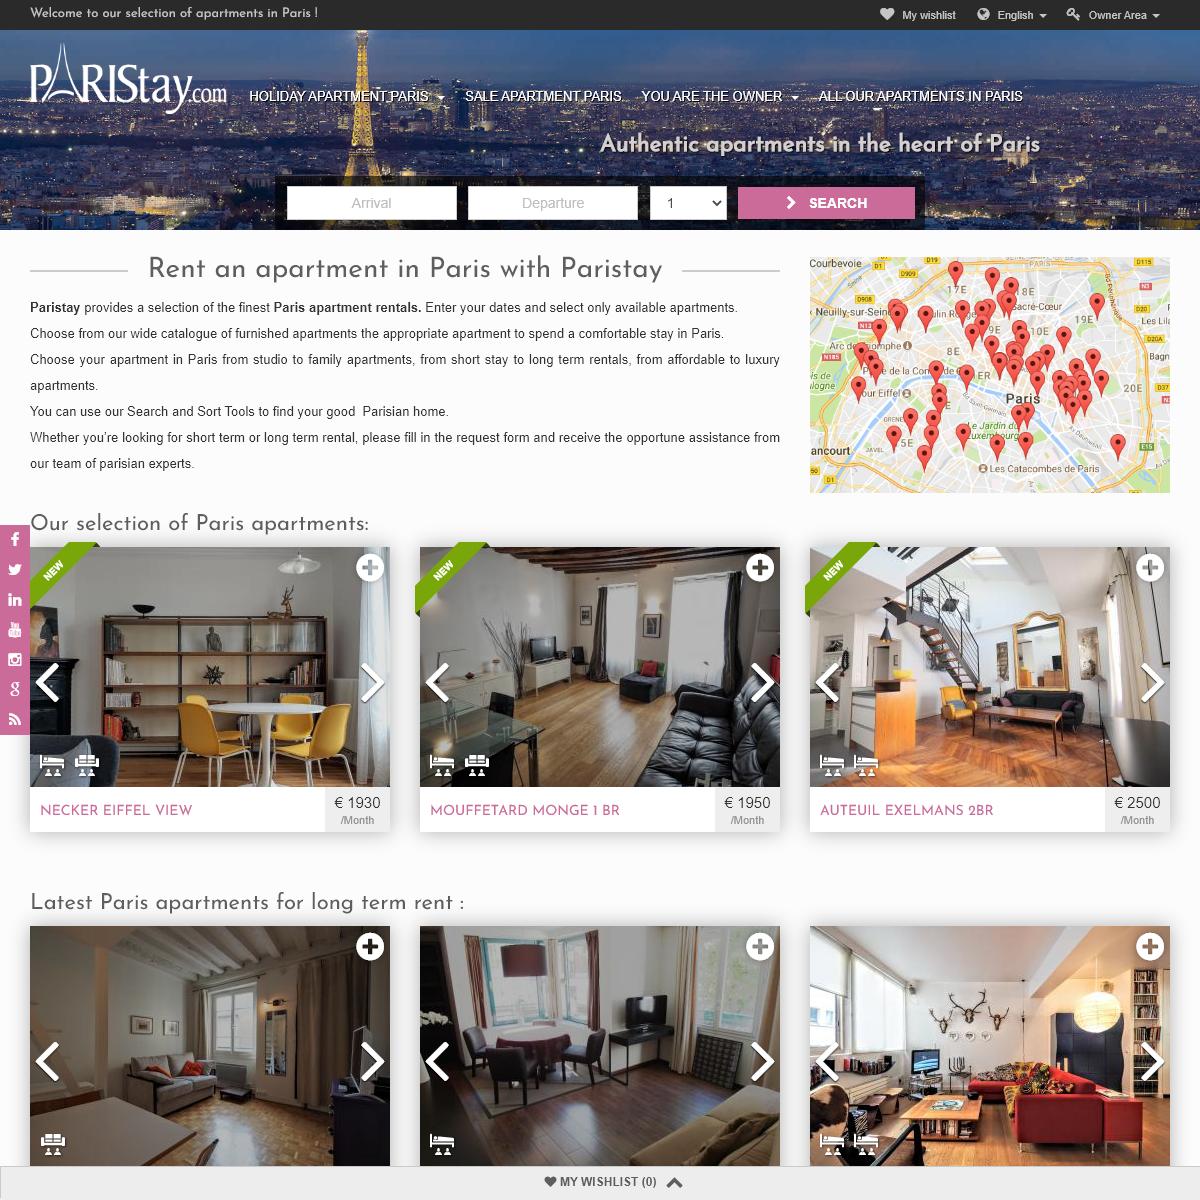 Paris apartments- apartments in Paris for short stay or long term rentals. Paris apartment for rent